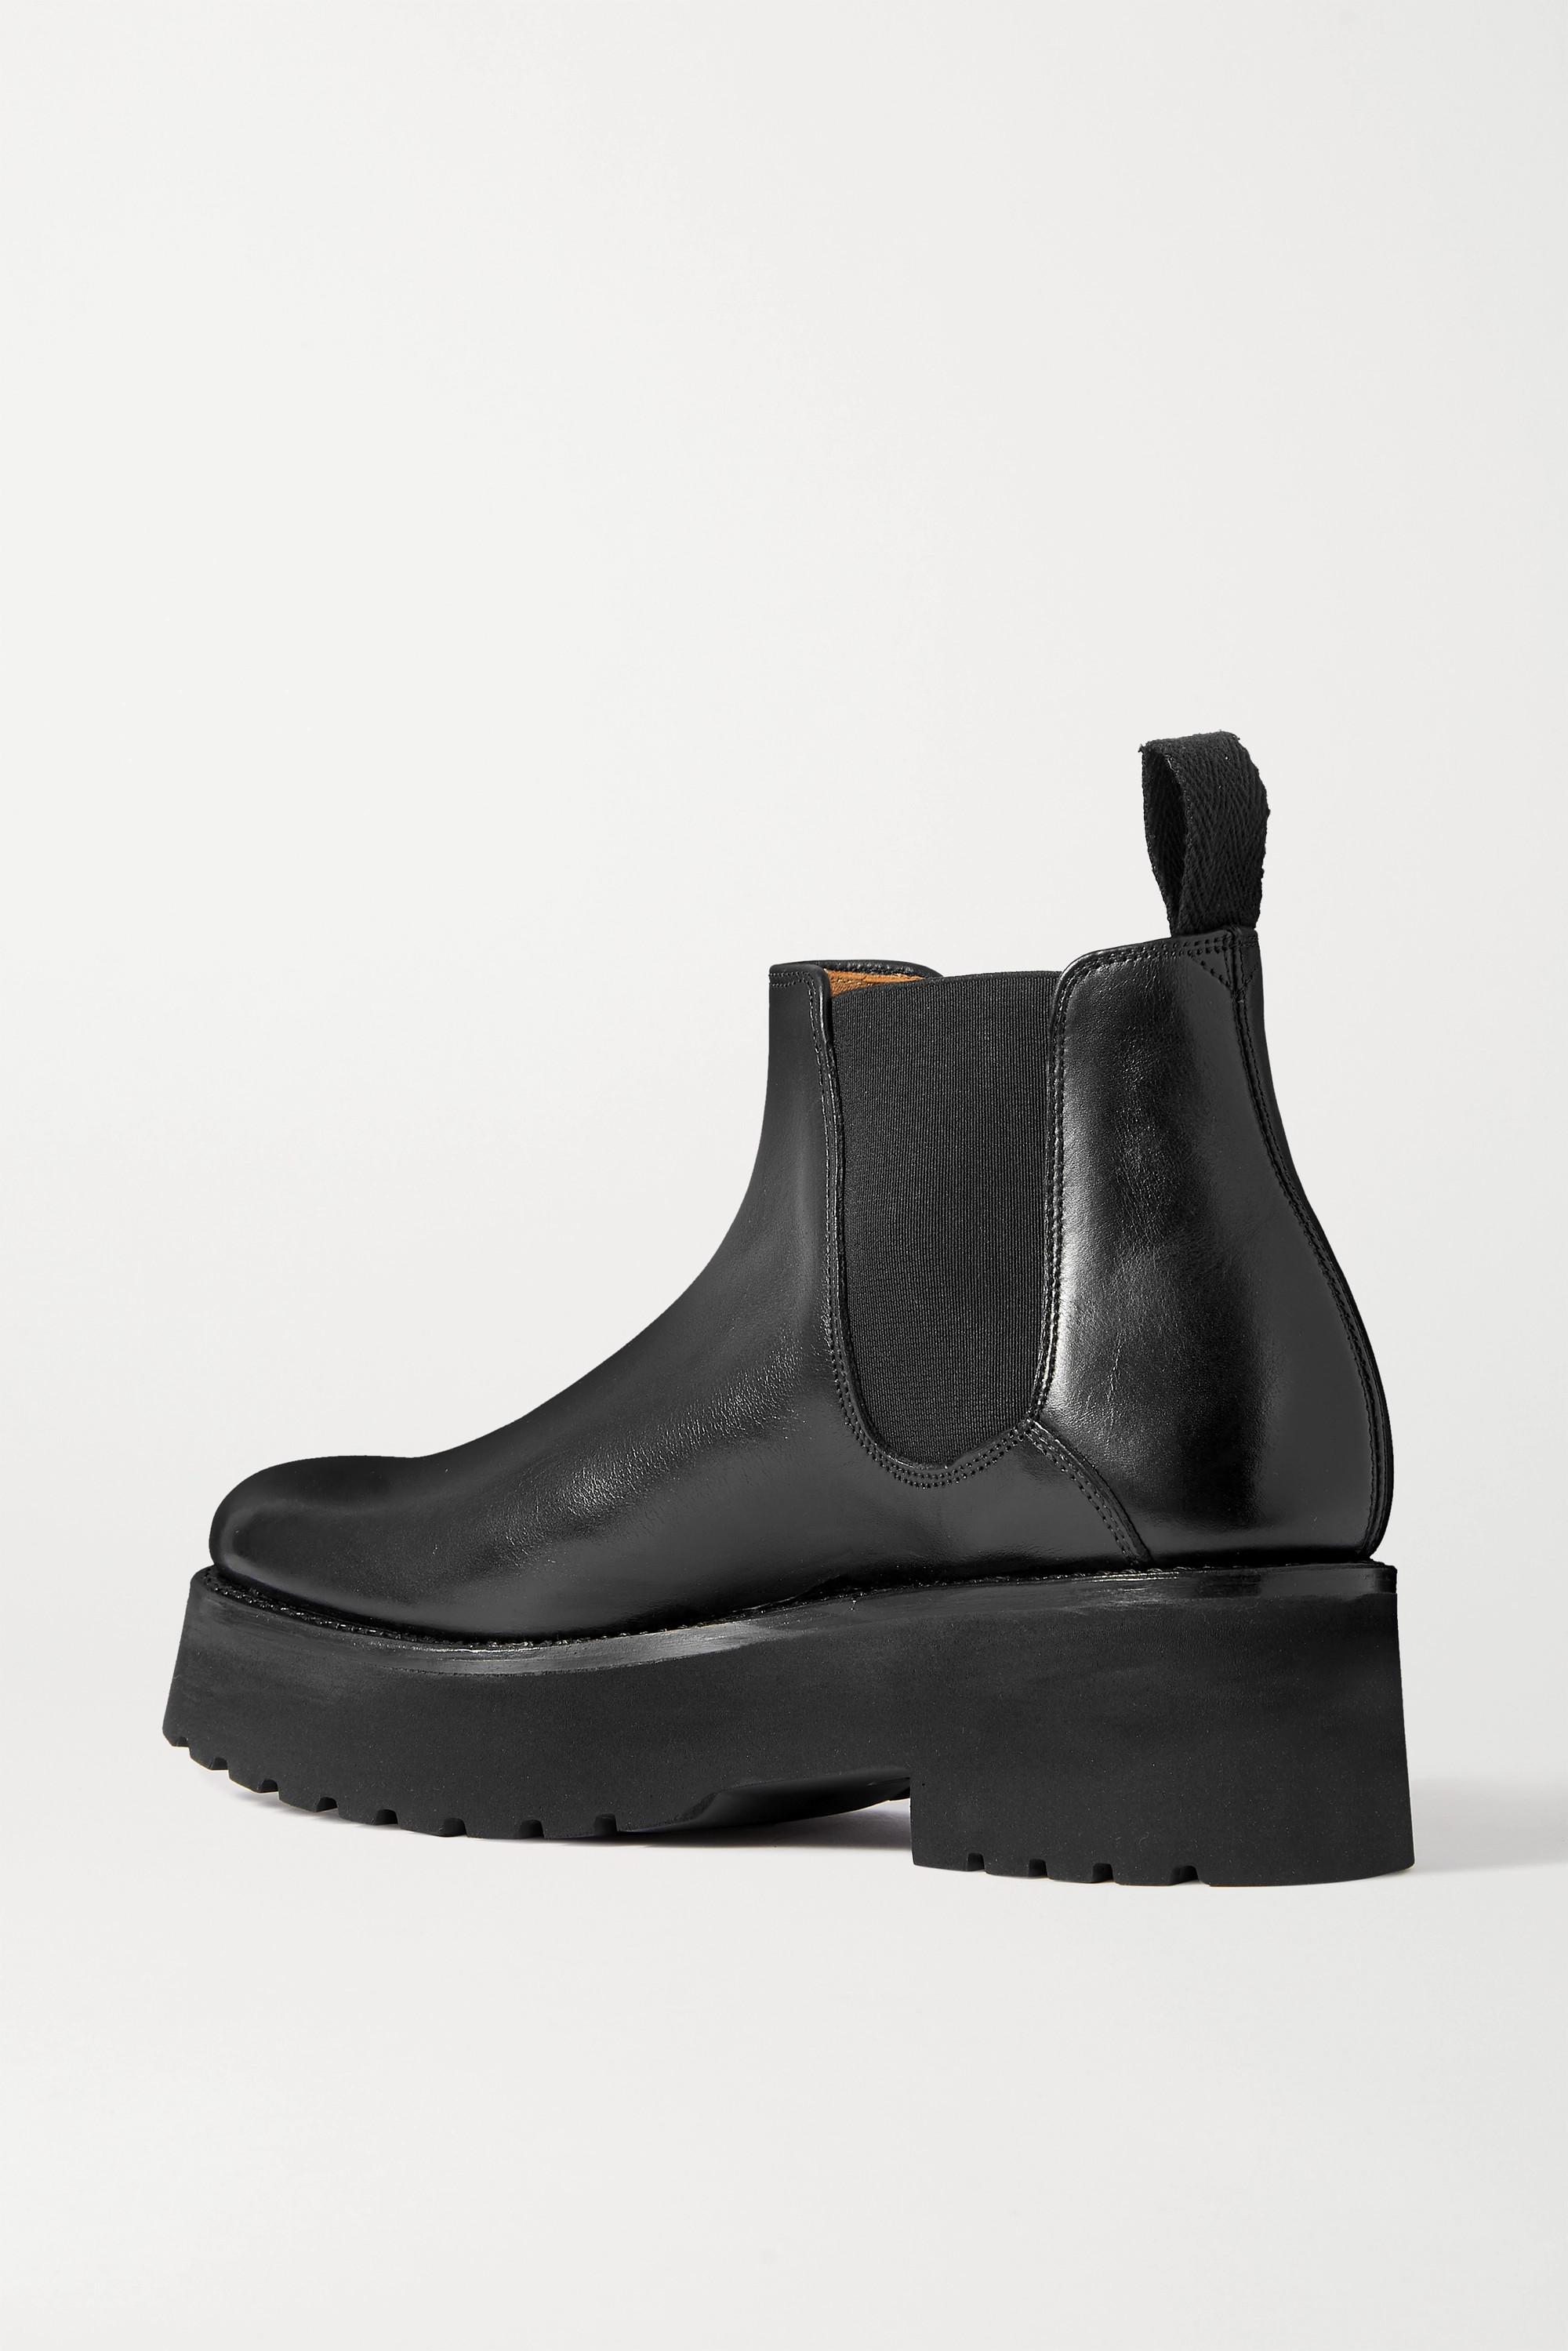 Grenson Naomi leather platform Chelsea boots